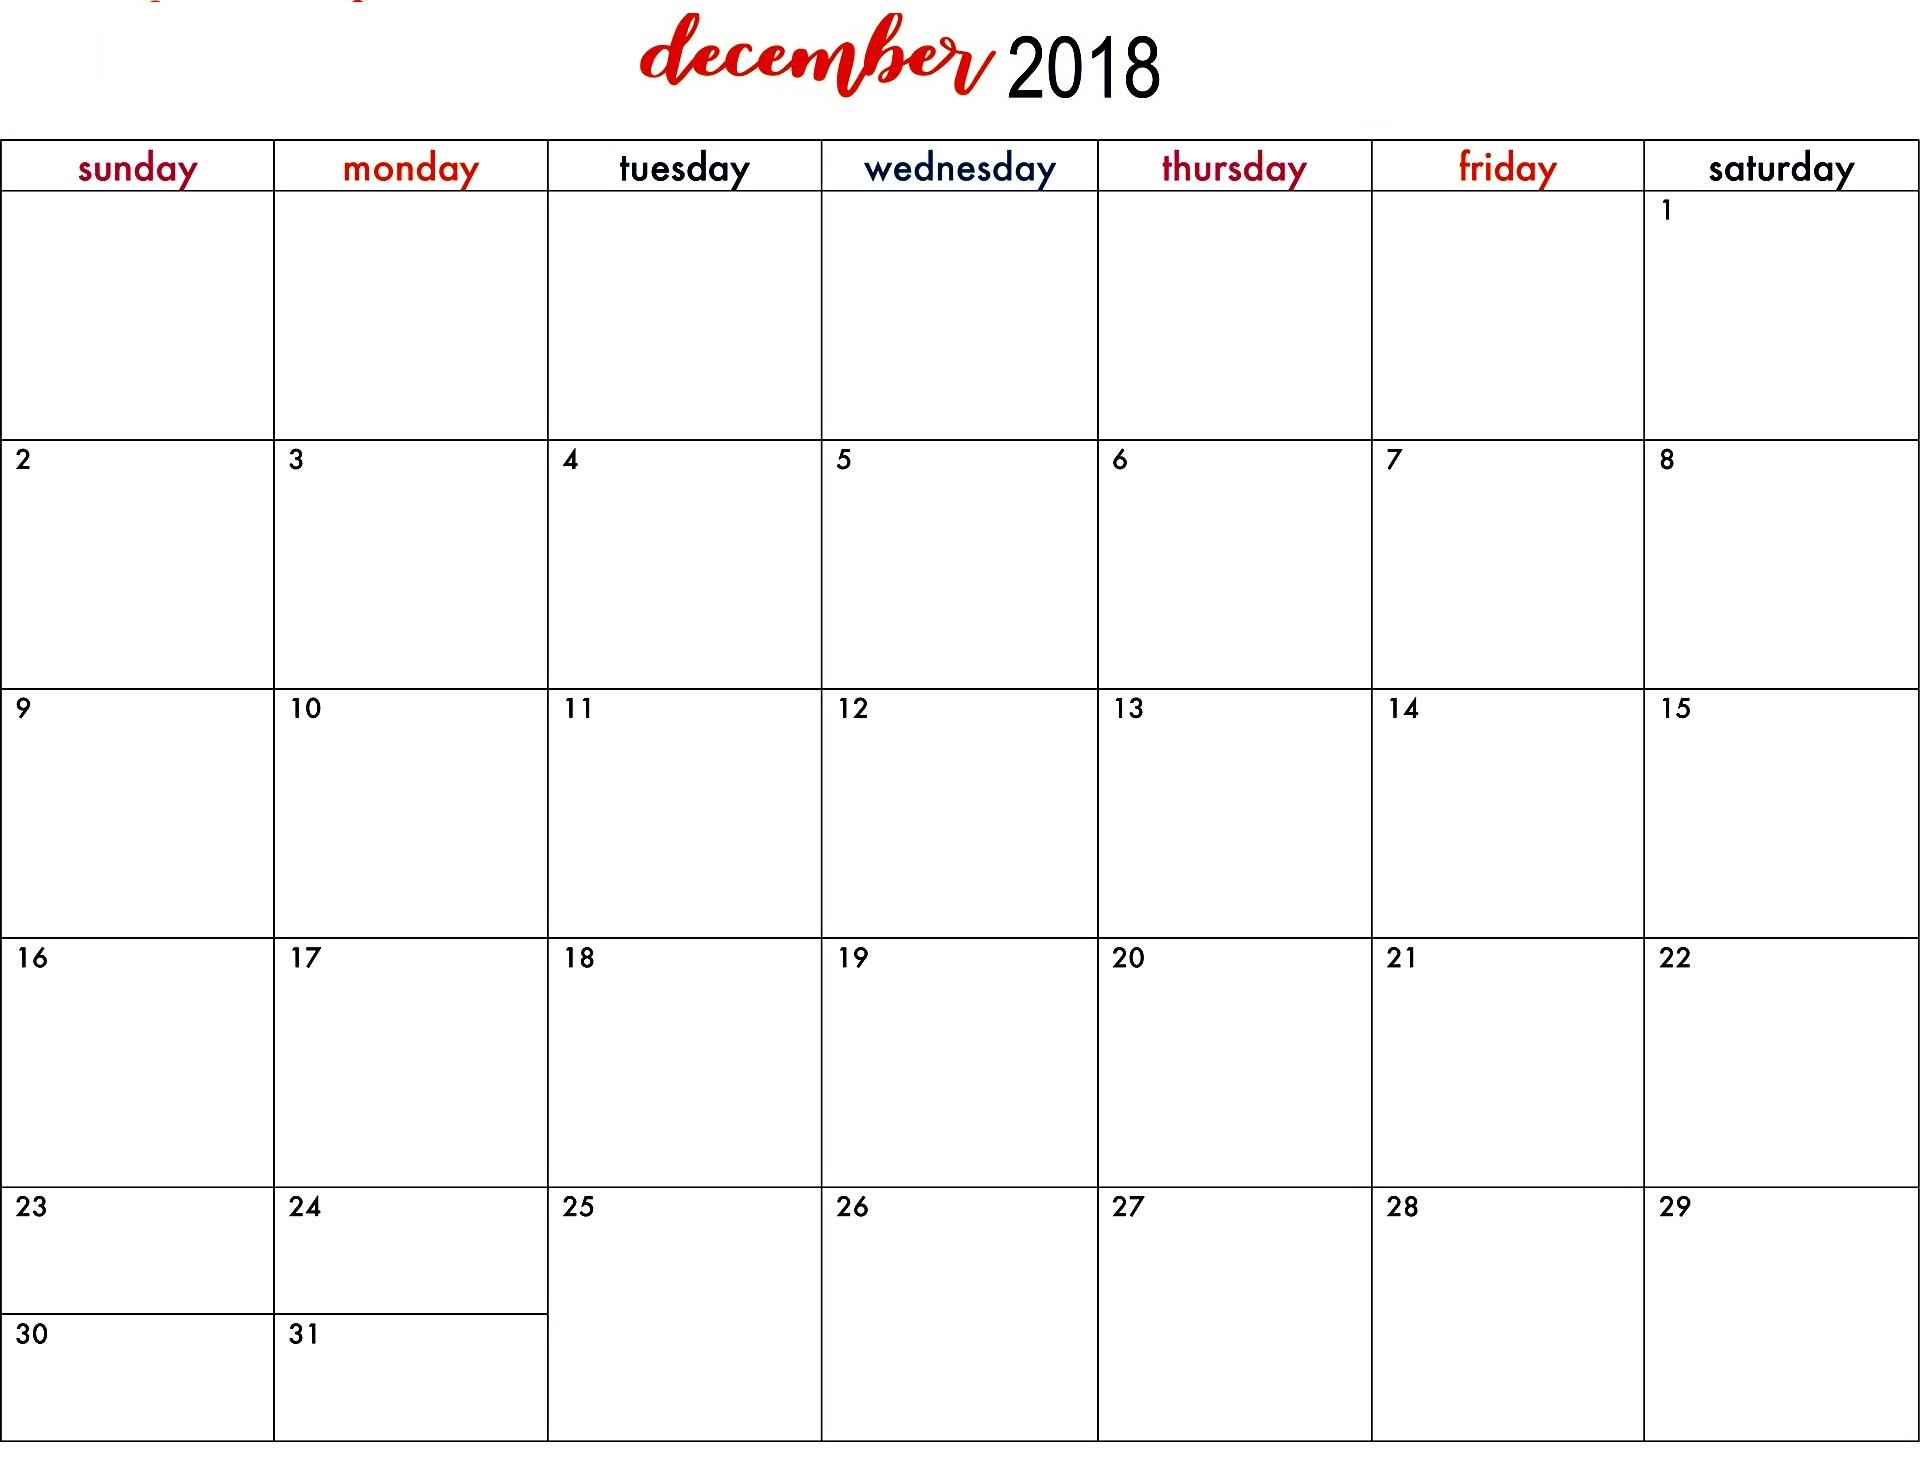 Print December 2018 Calendar With Holidays